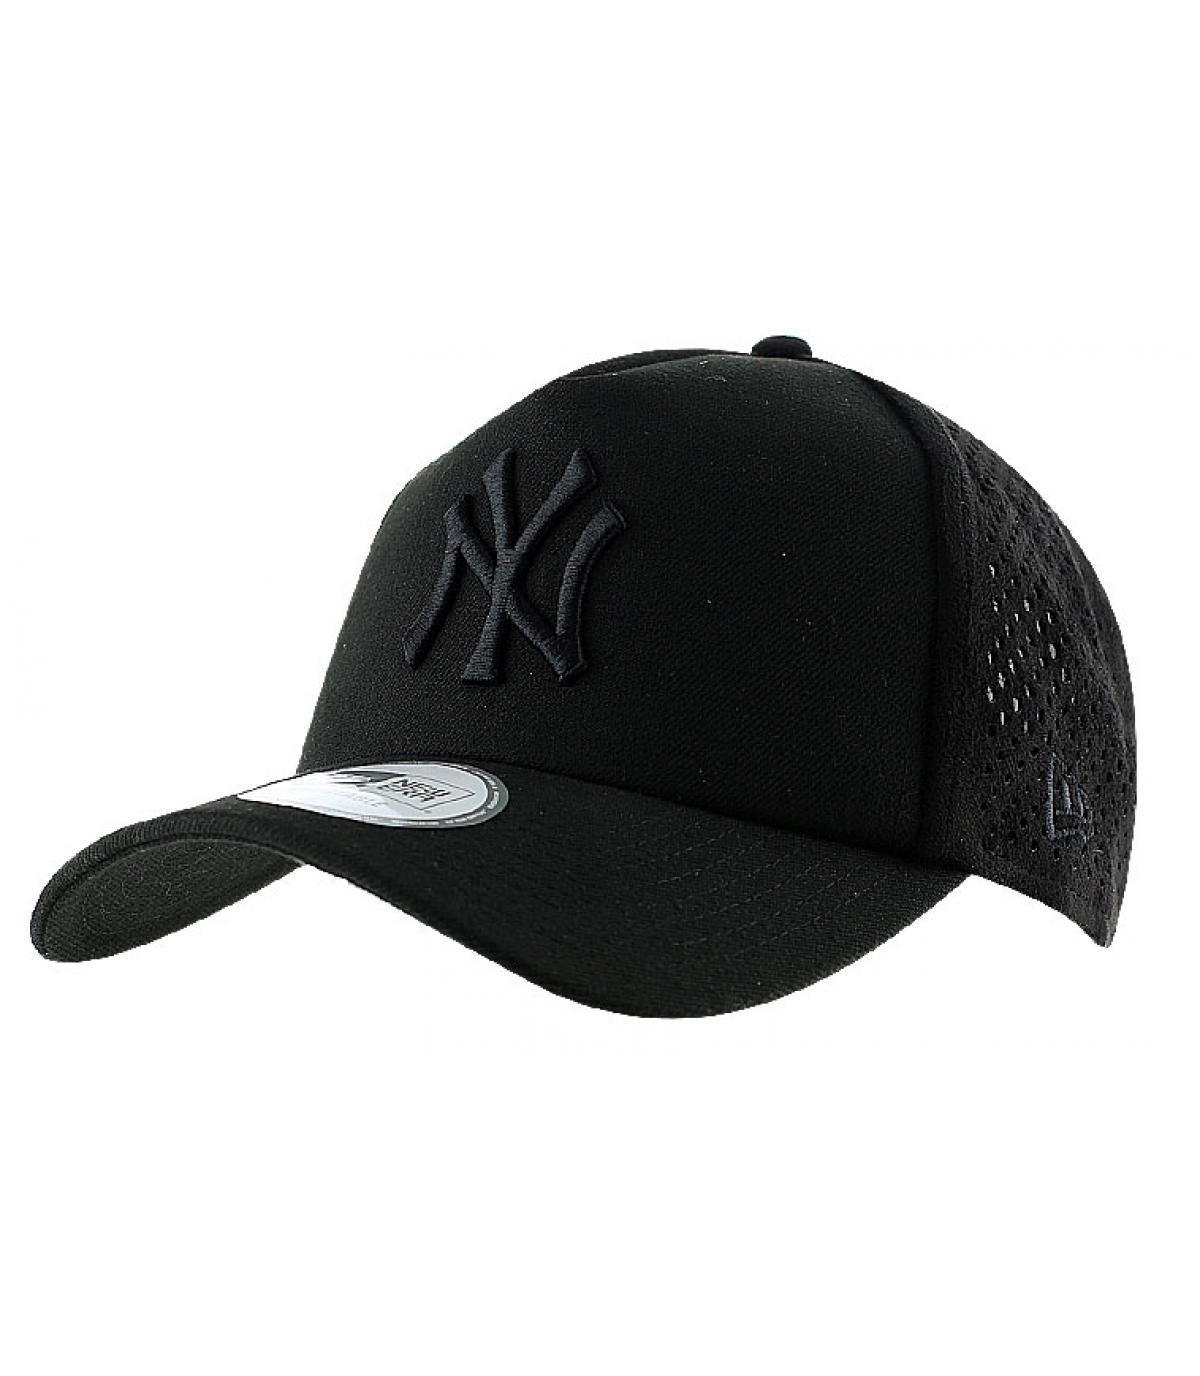 Cappellino rete nera New Era